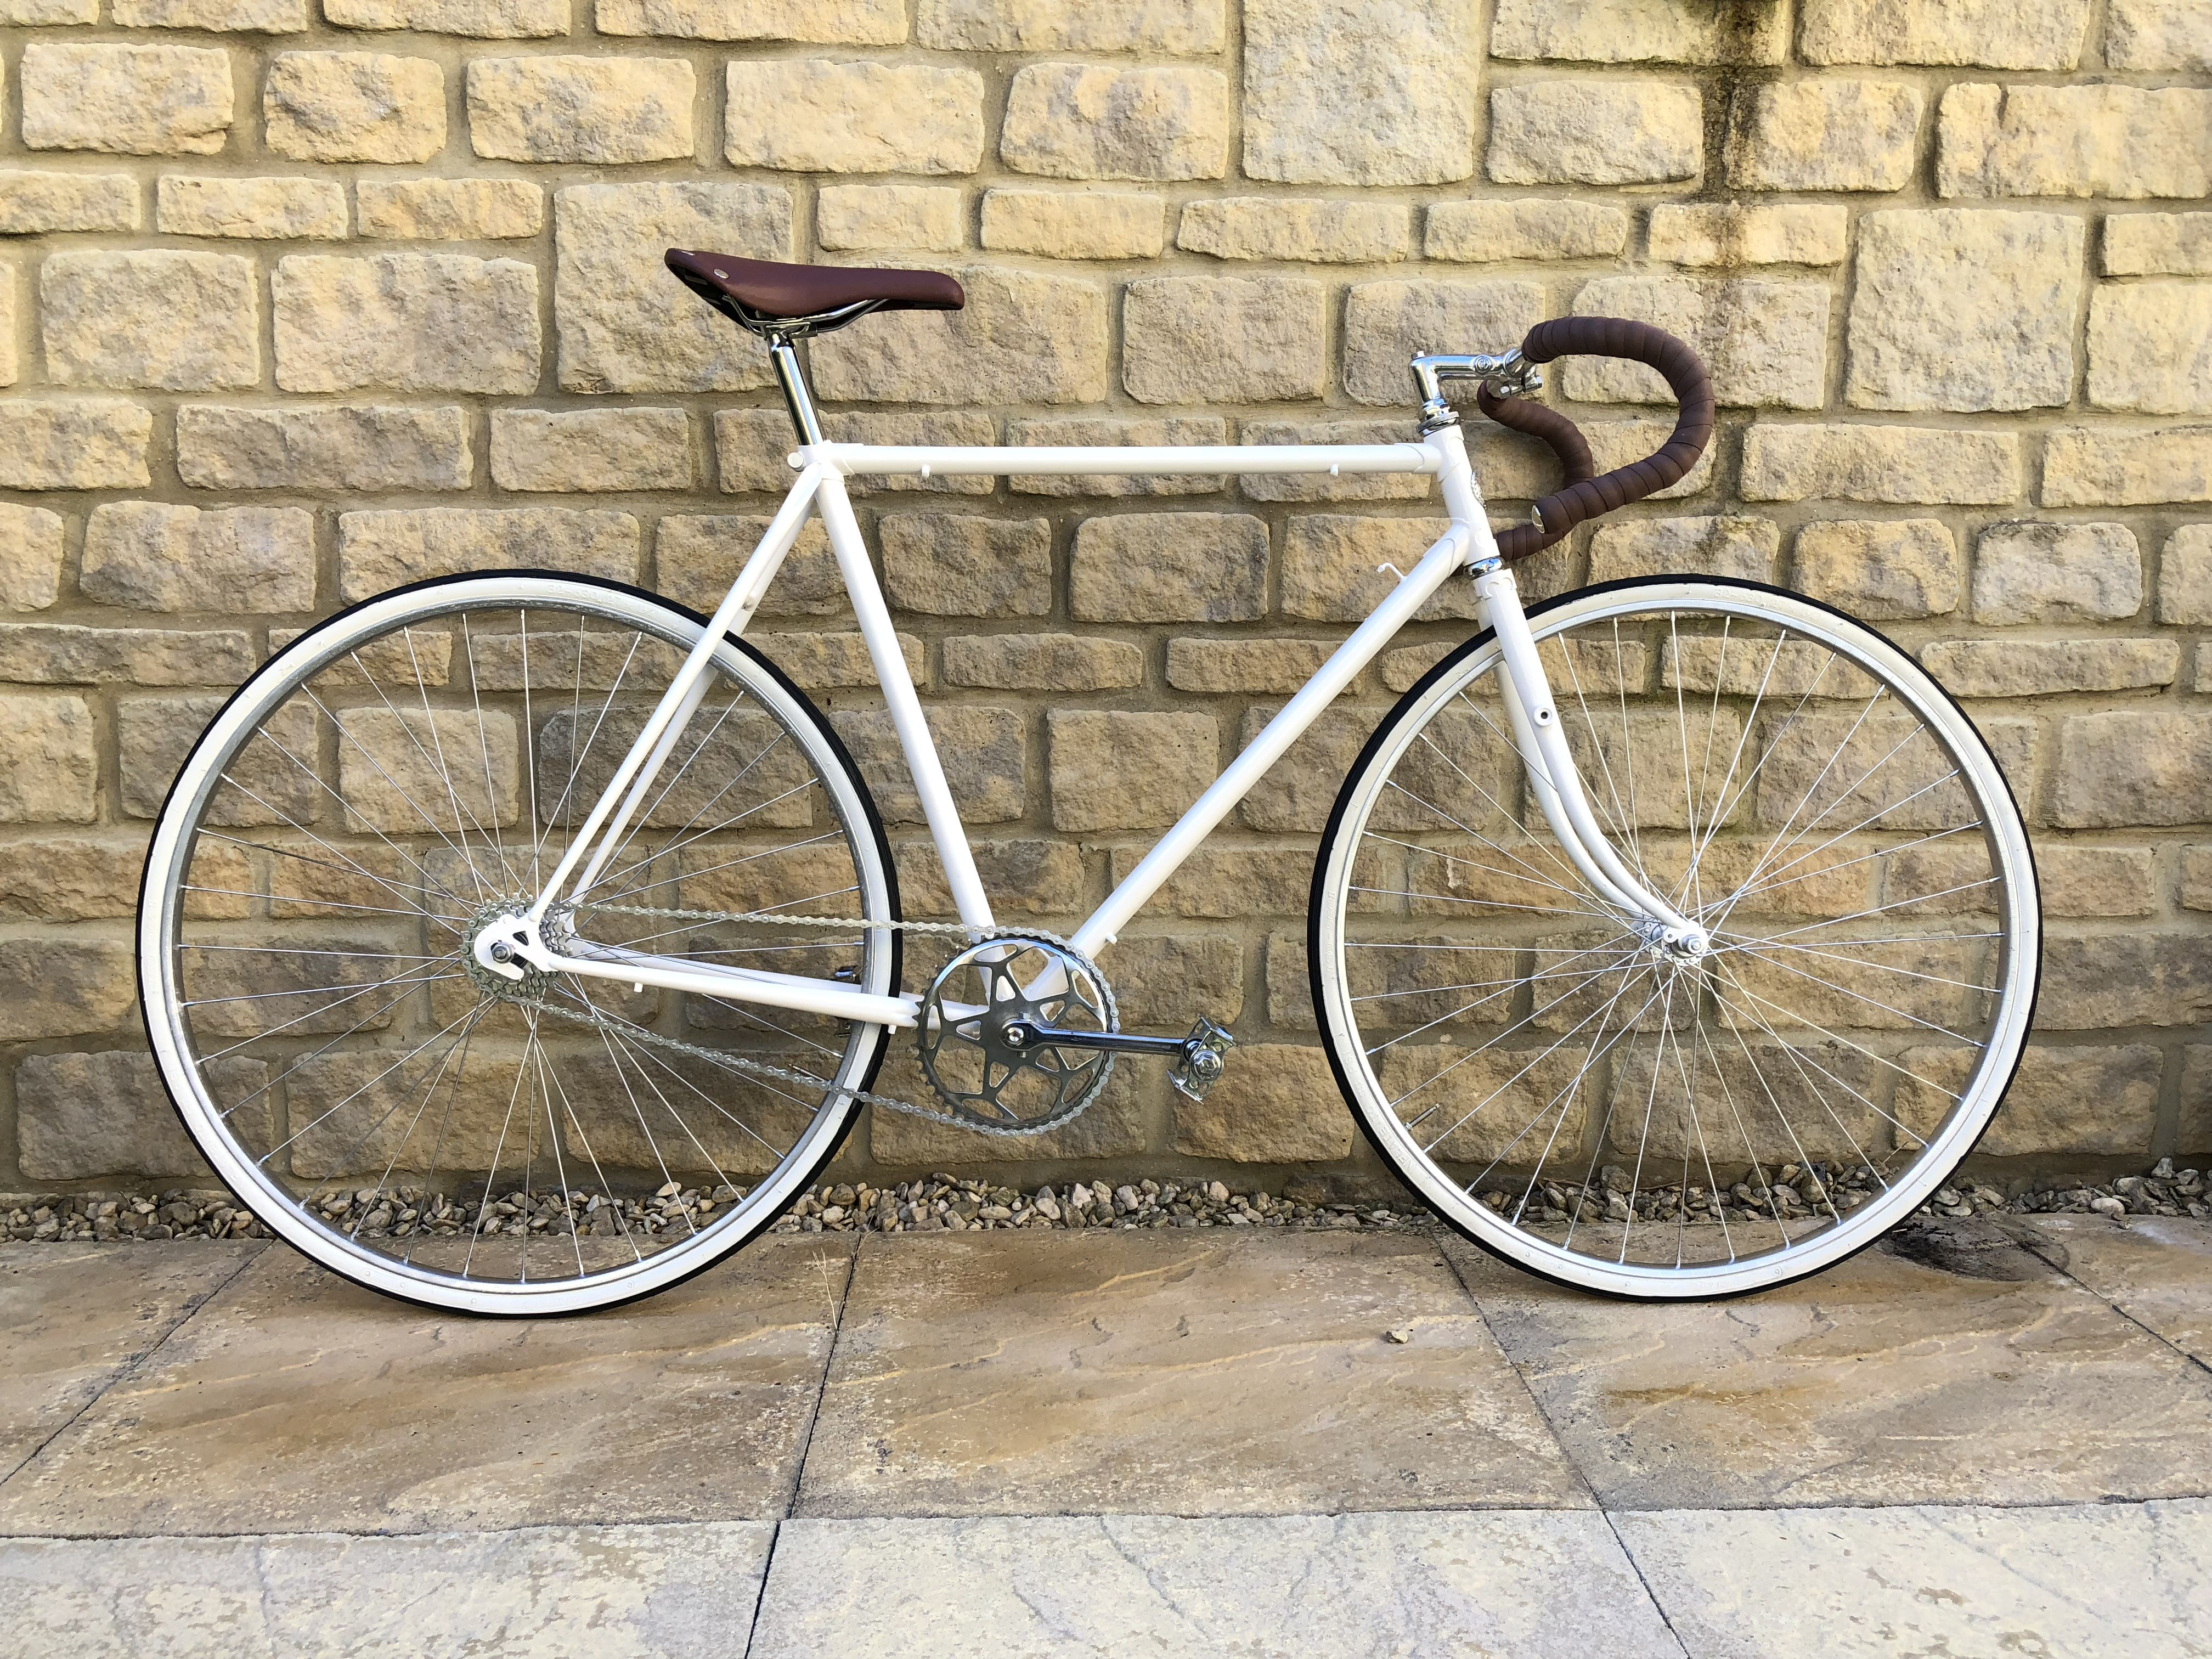 Vintage Roadbike Dawes Galaxy In White And Brown Road Bike Vintage Vintage Bikes Road Bike